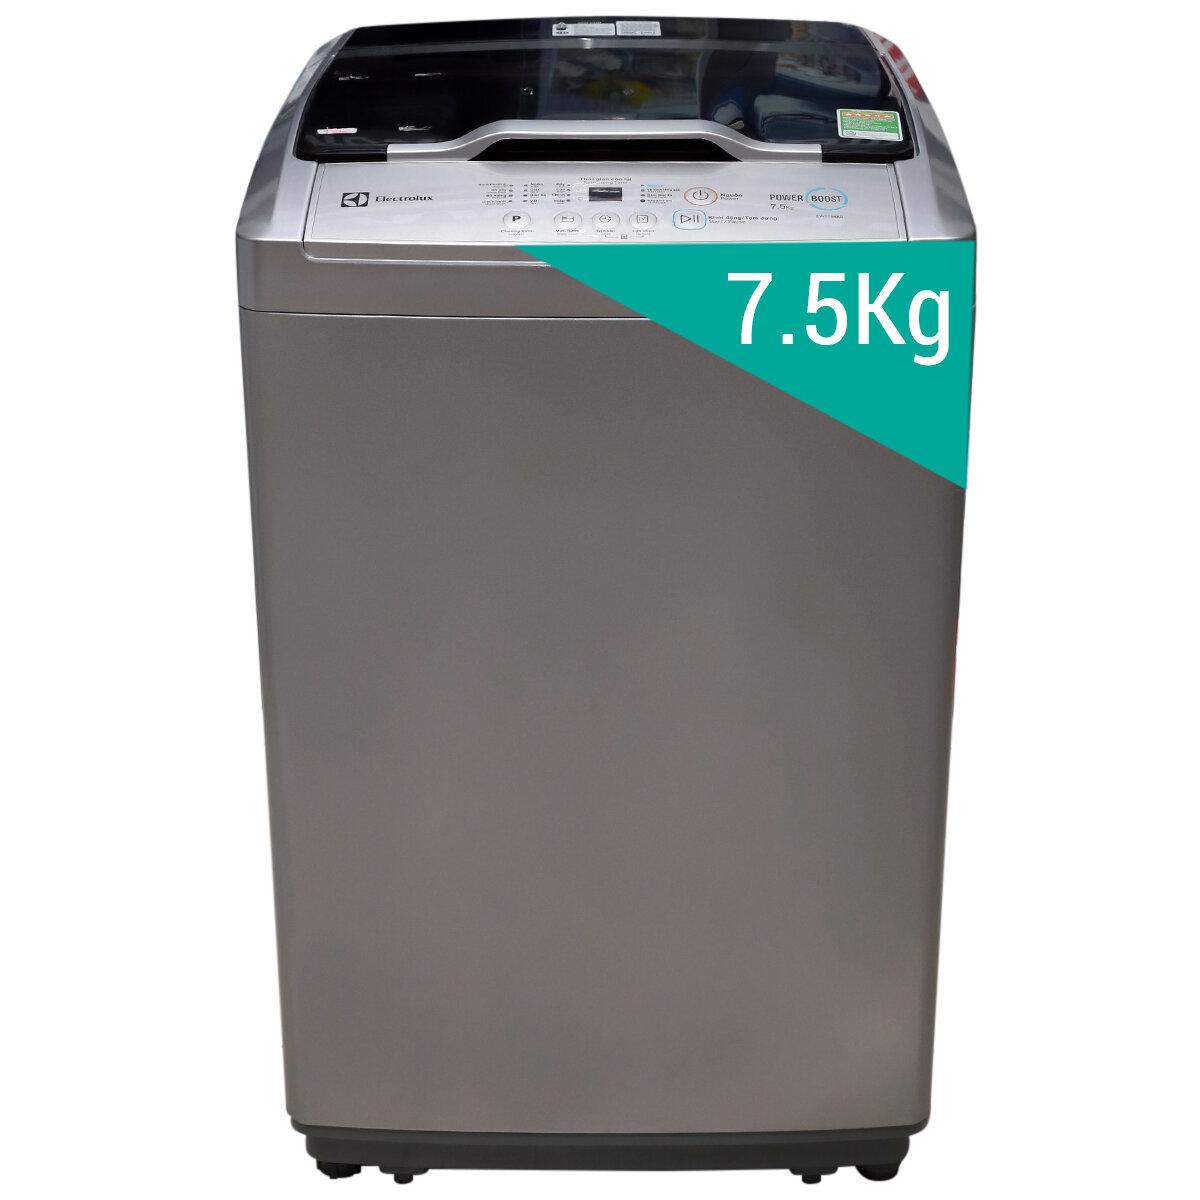 Đánh giá máy giặt giá rẻ Electrolux EWT754XS